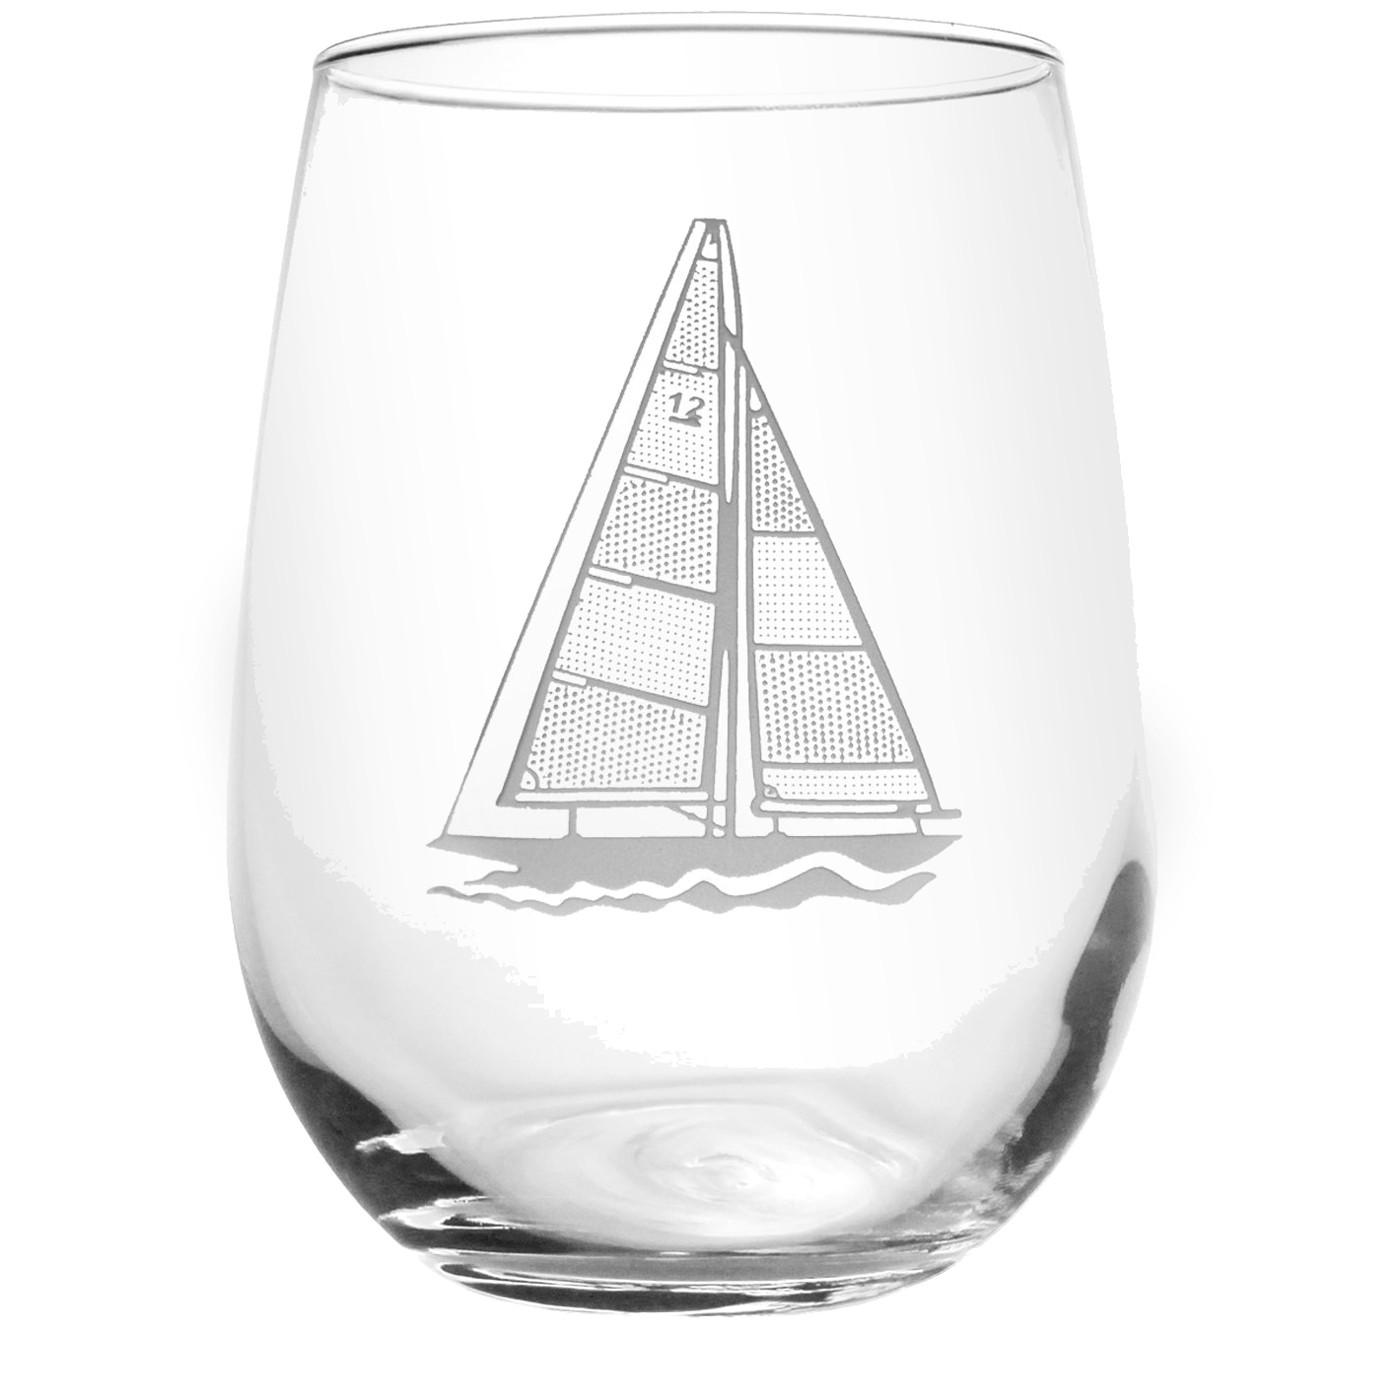 Rolf Glass Sailboat Stemless Tumbler